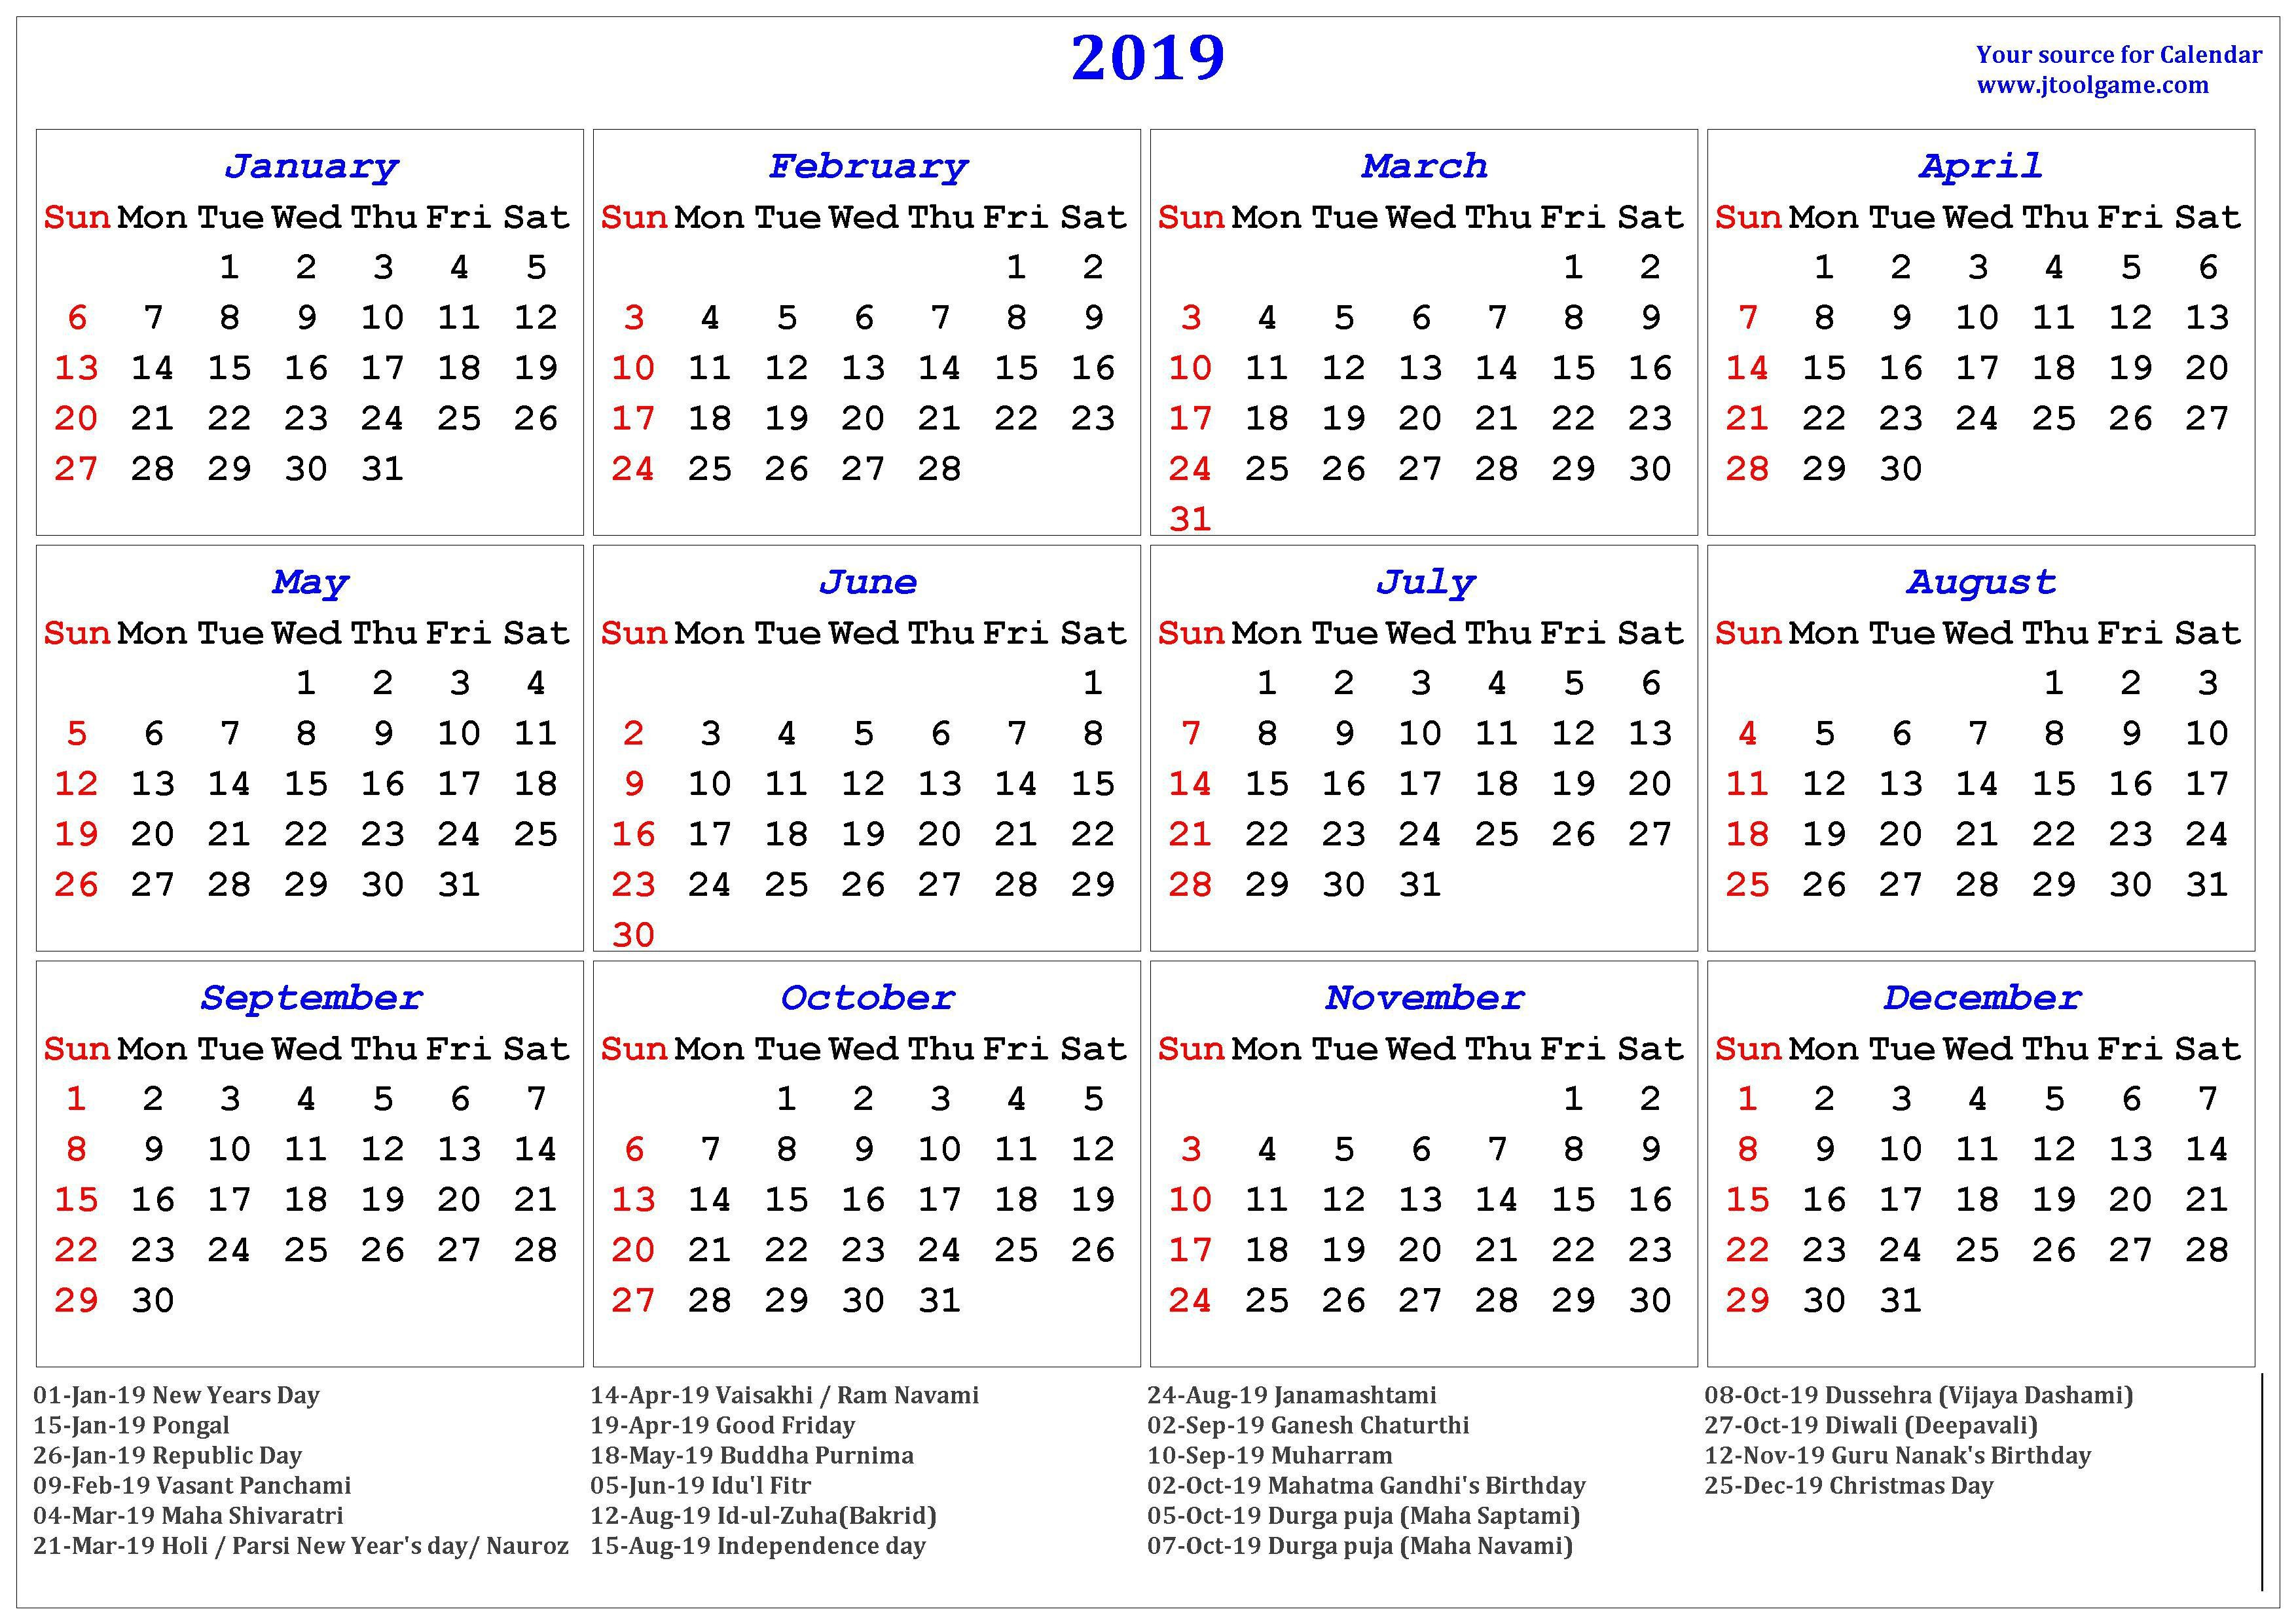 March Holiday Calendar 2019 Más Recientes 2019 Hindu Calendar with Tithi Of March Holiday Calendar 2019 Más Caliente Printable March 2019 Calendar Template Holidays Yes Calendars